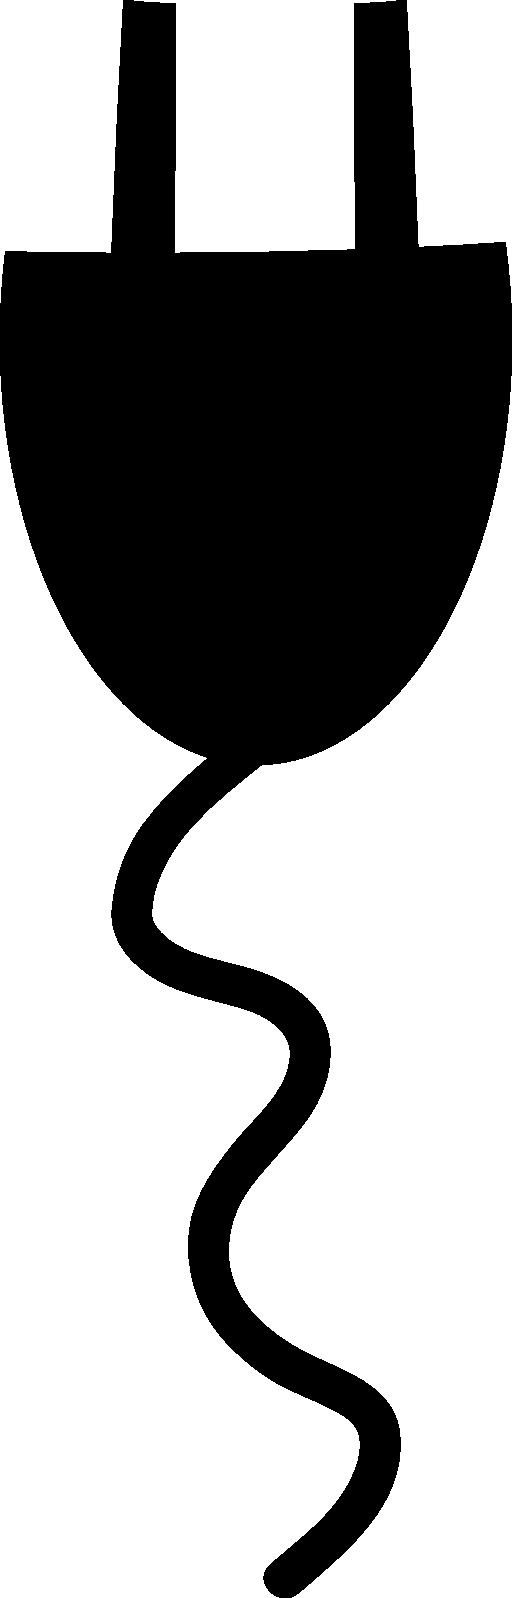 socket 20clipart Plug Outlet Graphic